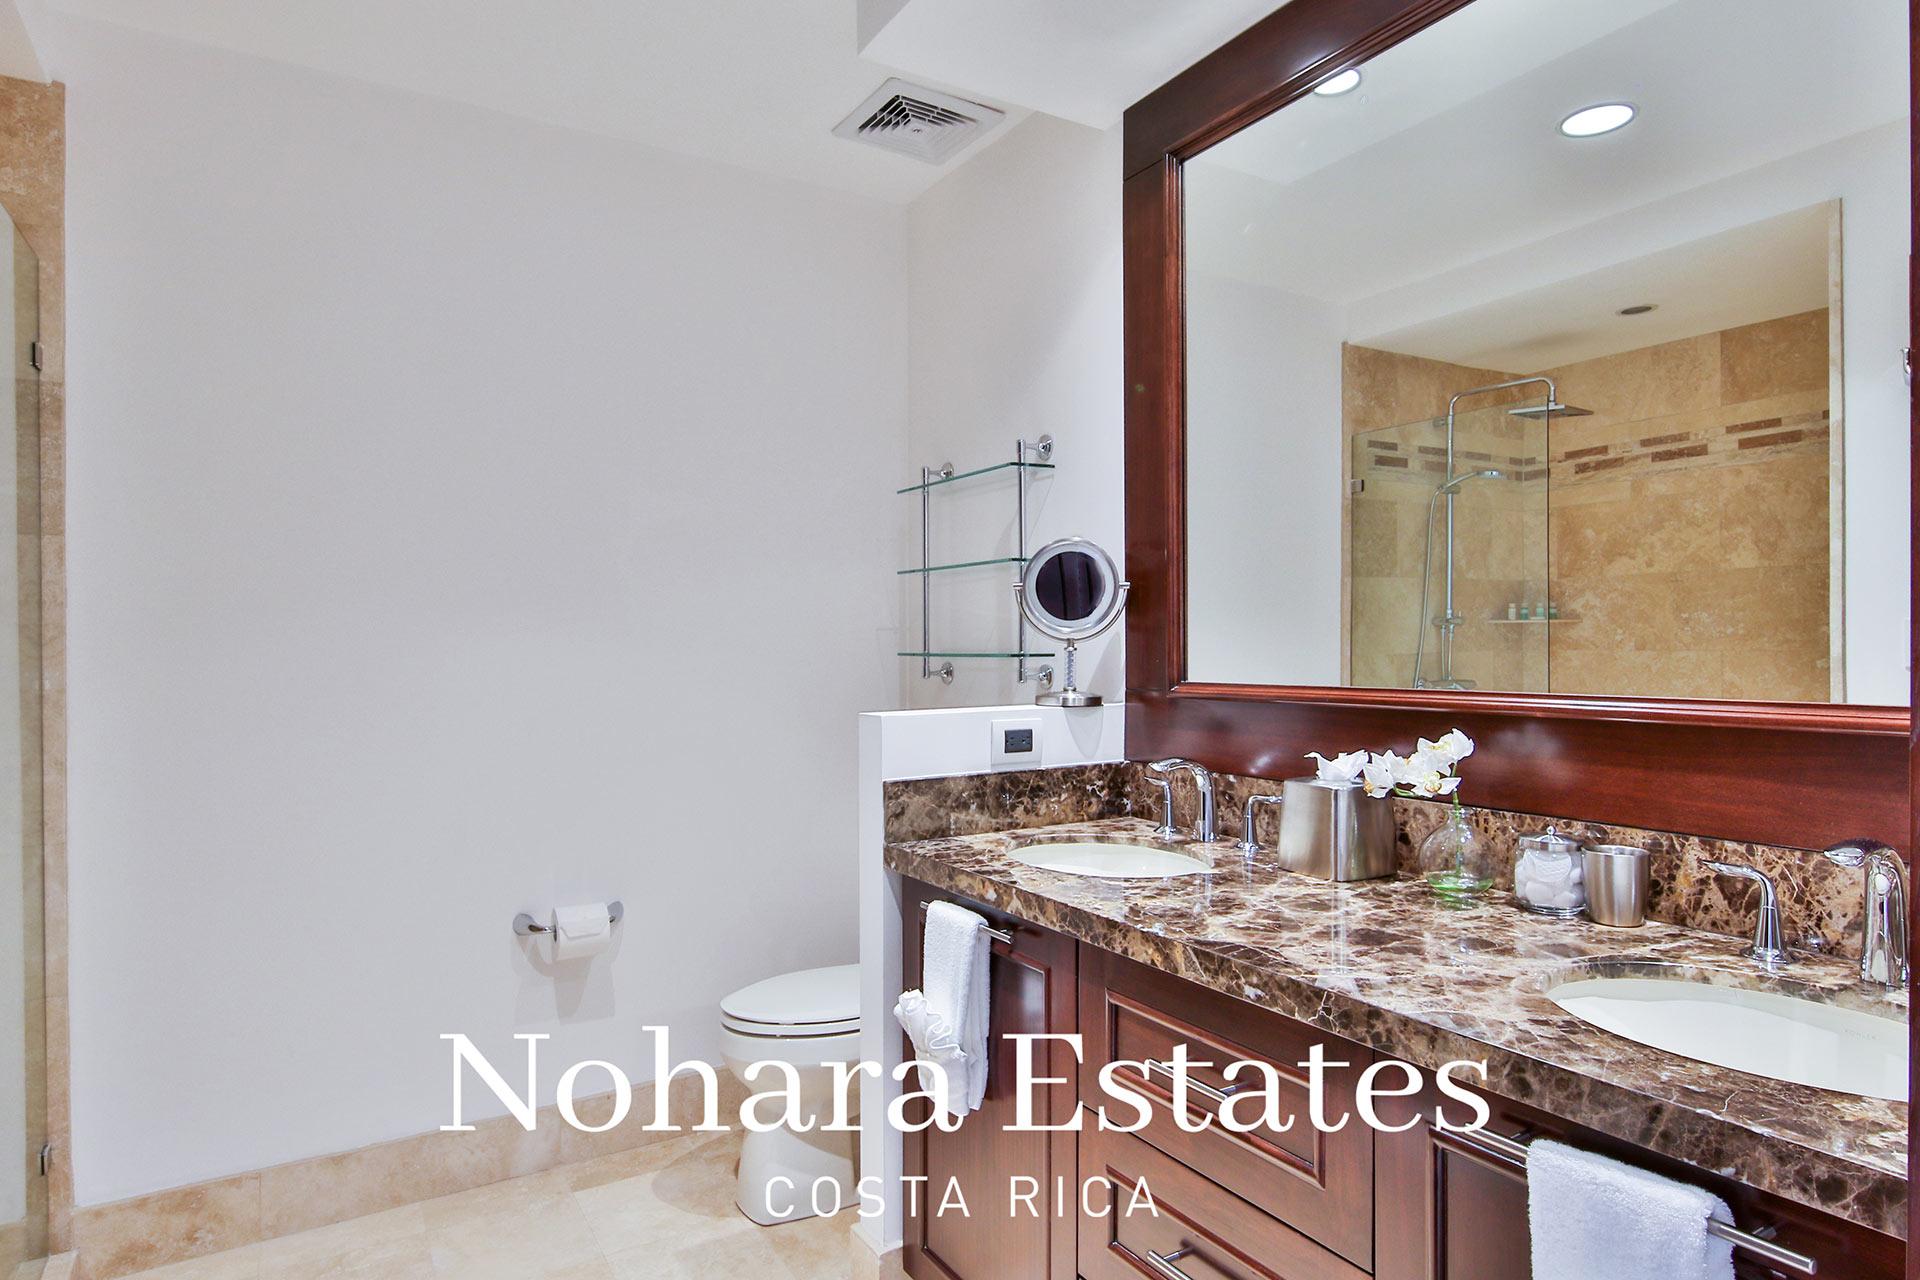 Nohara Estates Costa Rica Pacifico Playa Flamingo Pool Front Apartment 4